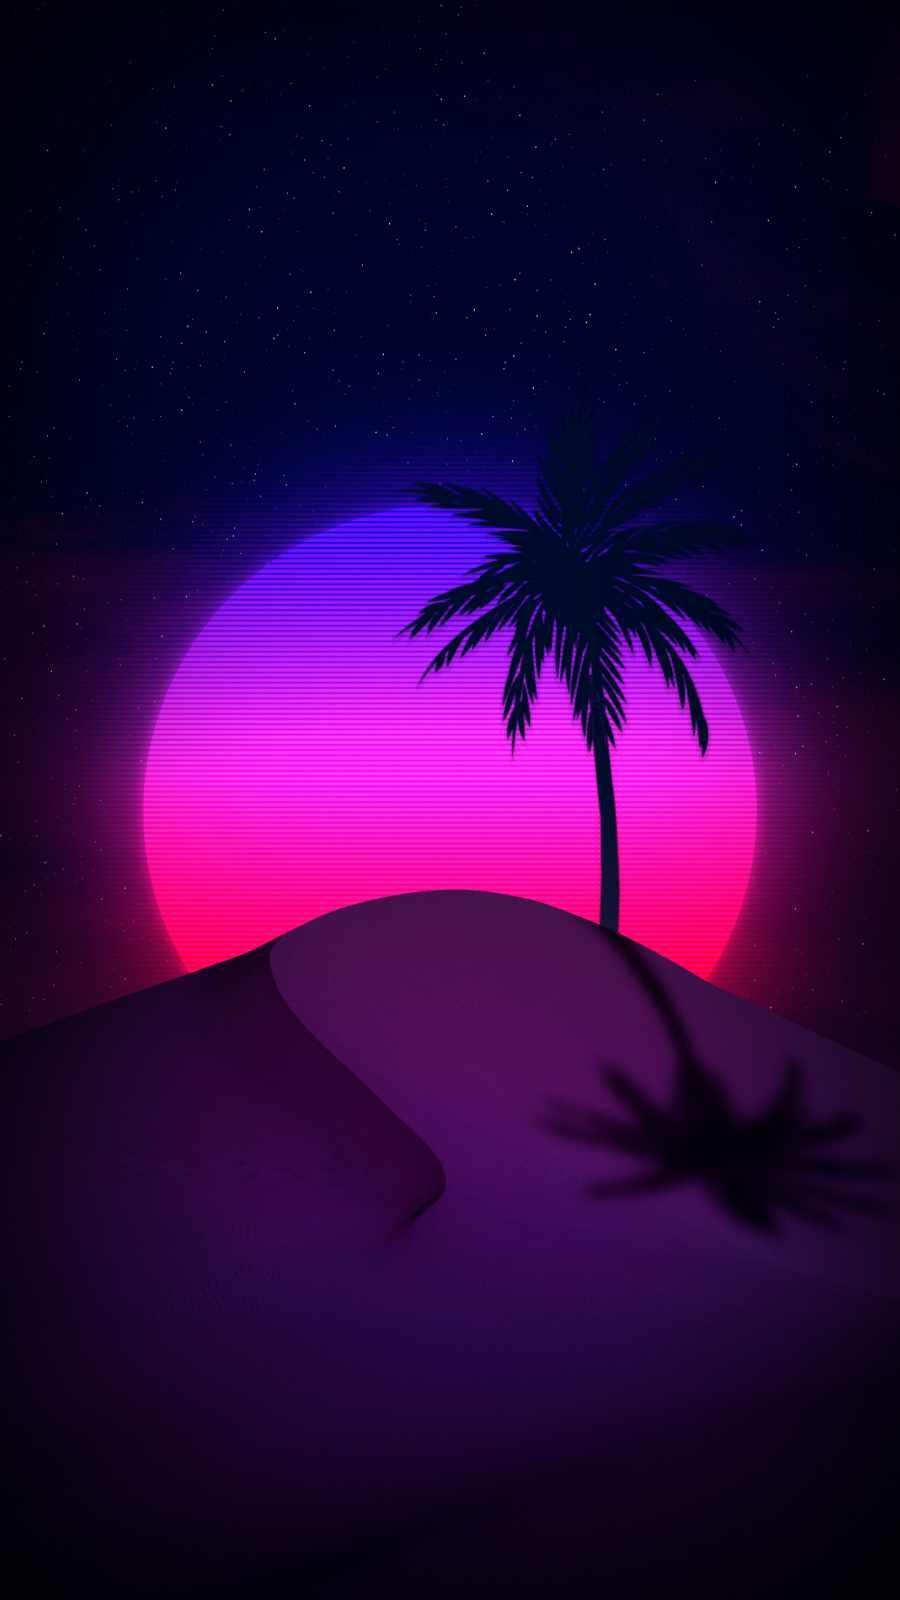 Desert Retro Moon iPhone Wallpaper